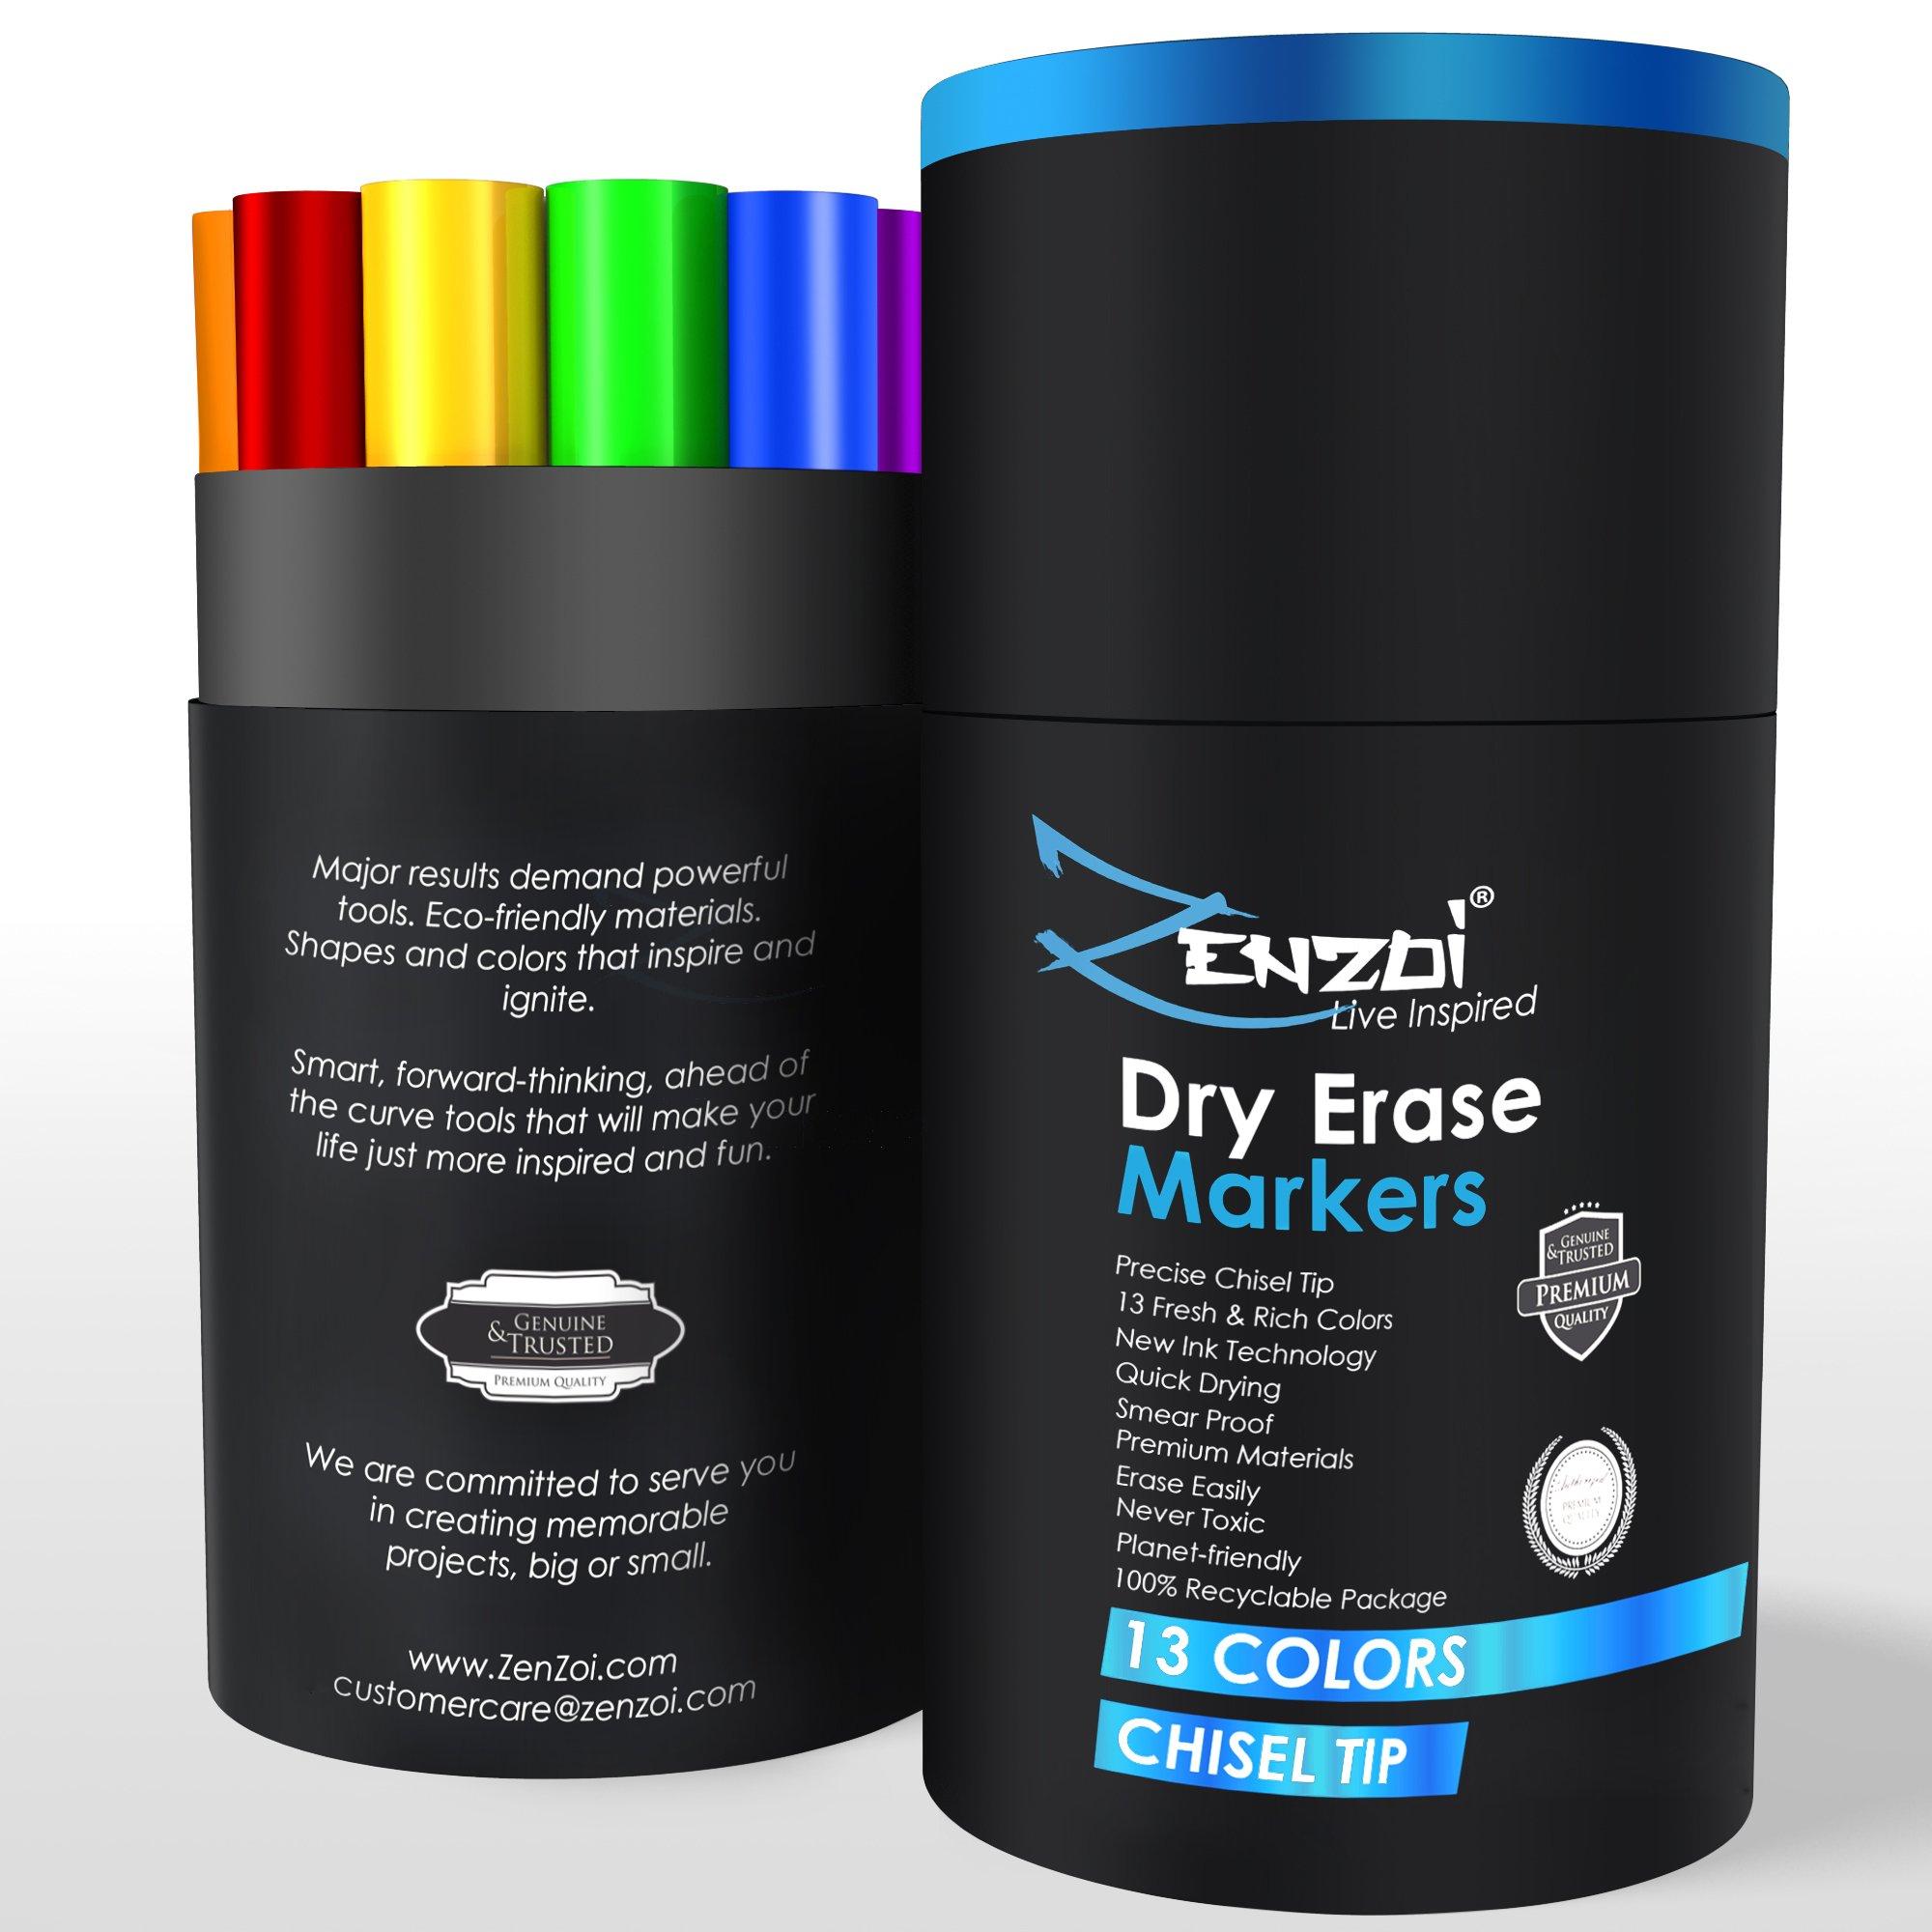 Dry Erase Markers Whiteboard Marker Set Erasable Pens - CHISEL Tip - 13 Vivid, Fresh Colors - You Get FREE Gift eBook - For Kids Office White Board Calendar Not Black Magnetic Bulk Erasers